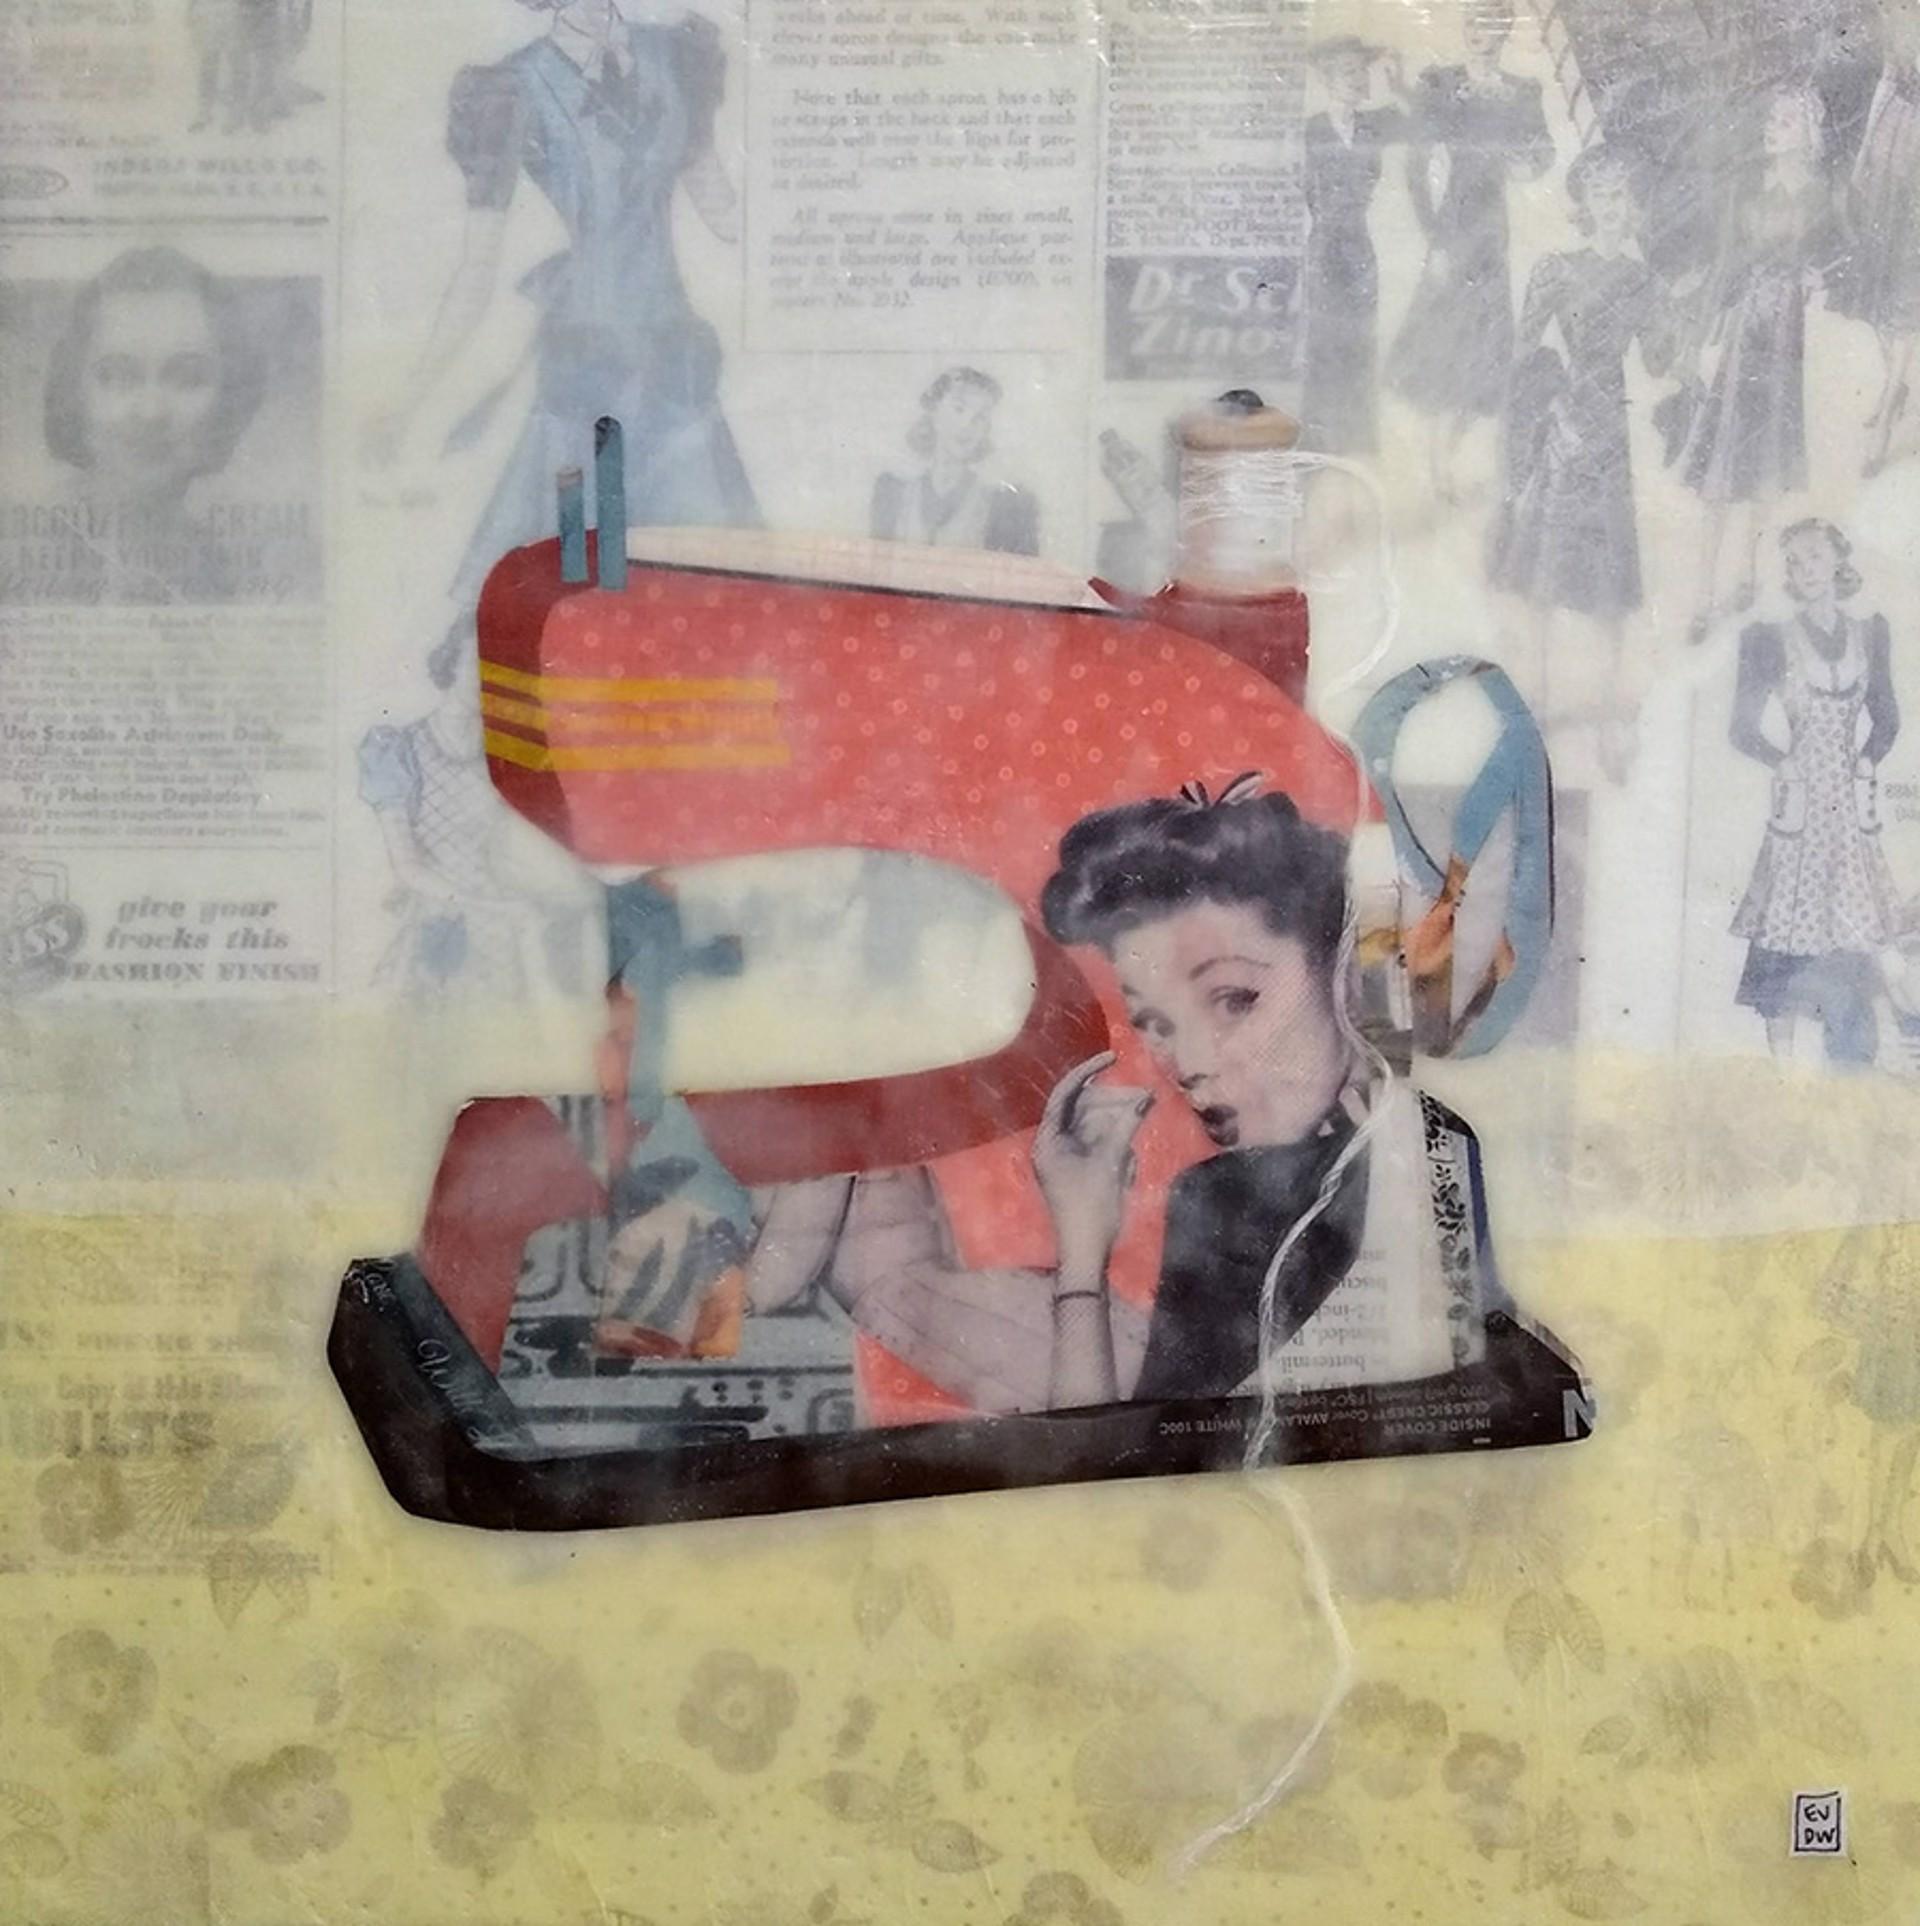 sewing machine by Evelyn Davis-Walker